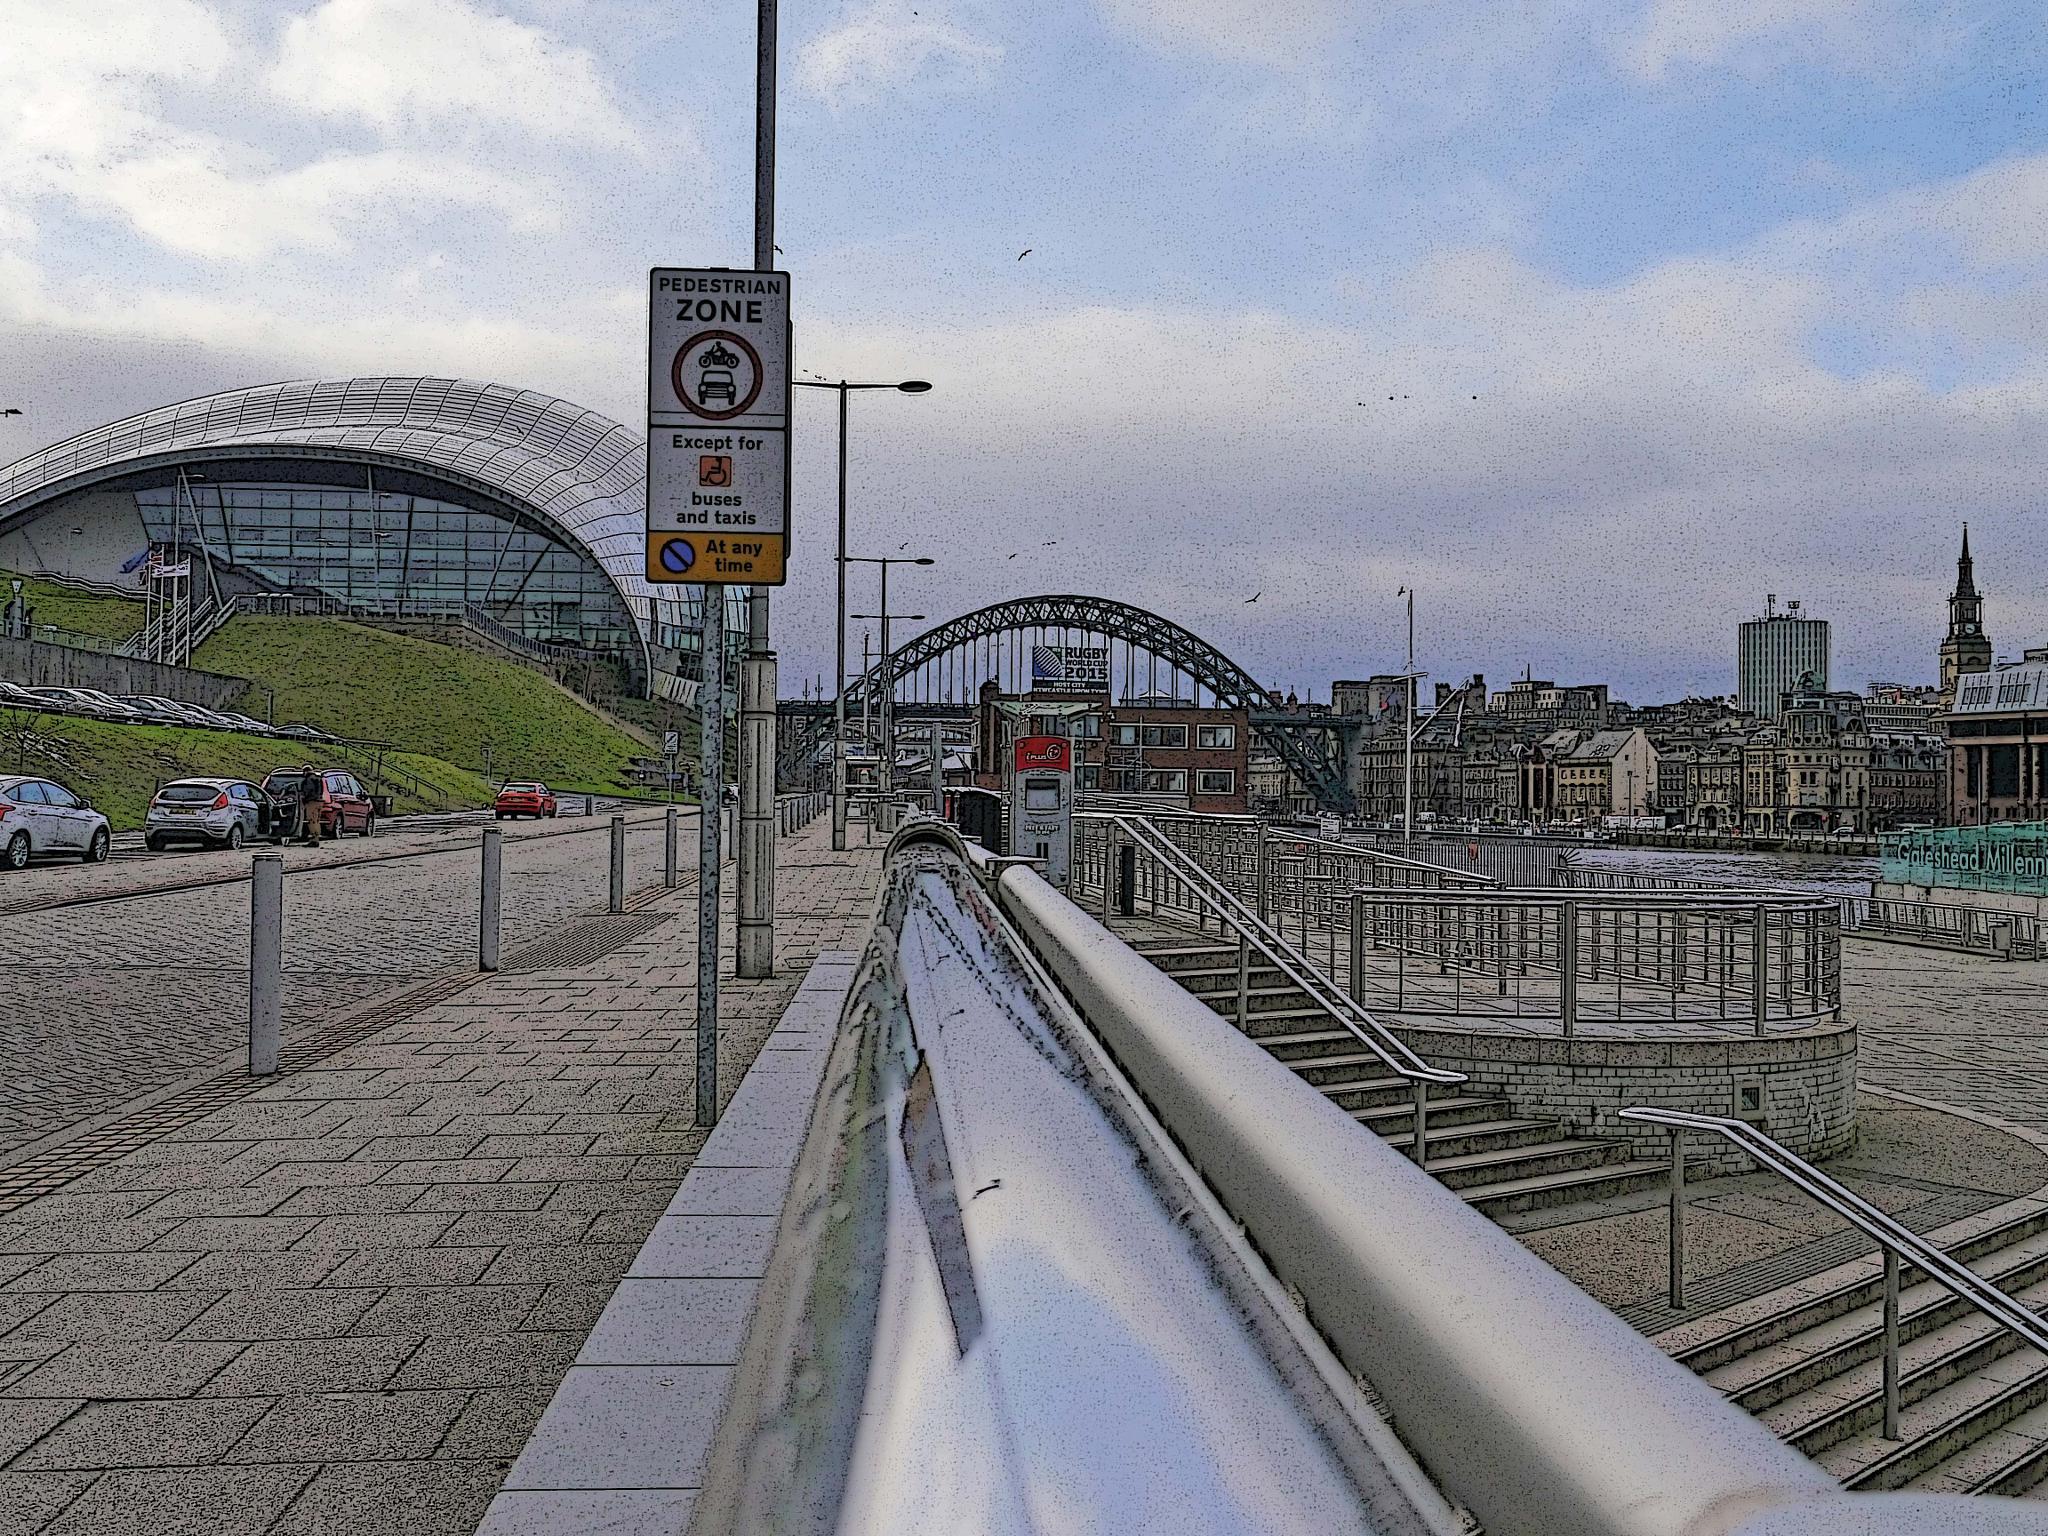 Gateshead Quayside today by Darren Turner